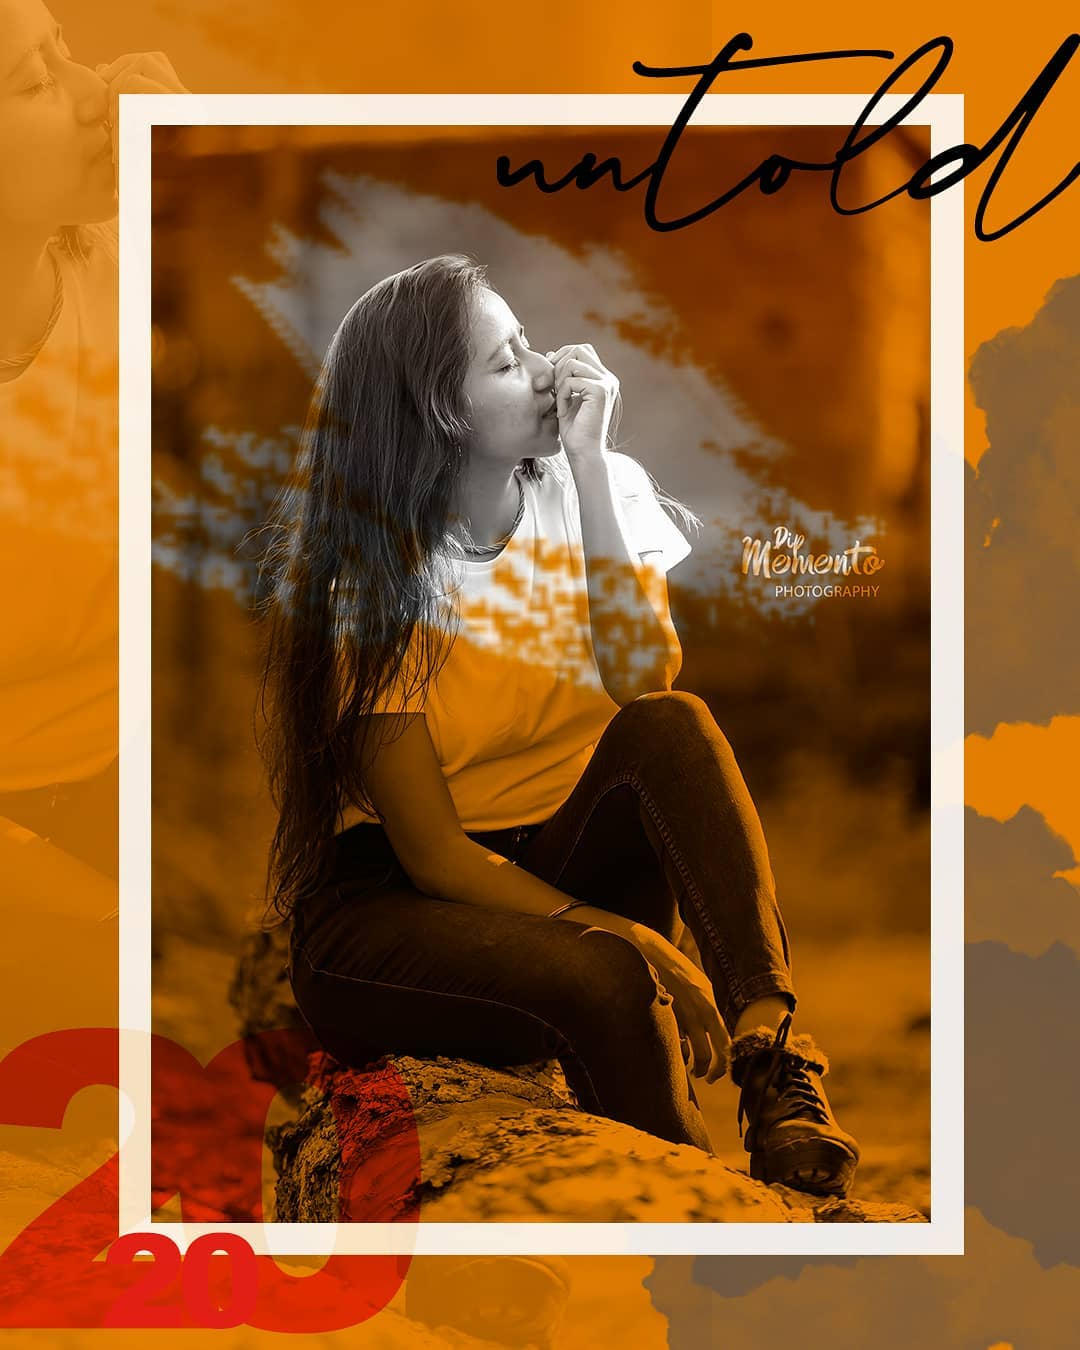 Dip Memento Photography,  Canon, Godox, Fashion, bloggerphotography, indian, desibloggers, outfitinspiration, styleoftheday, modelphotography, vogue, glamourmodel, modeling, modellife📸, modelportfolio, photography, hotmodels, womenportrait, f4f, 9924227745, portraitfestival, ahmedabad, vadodara, surat, rajkot, dipmementophotography, portrait_shots